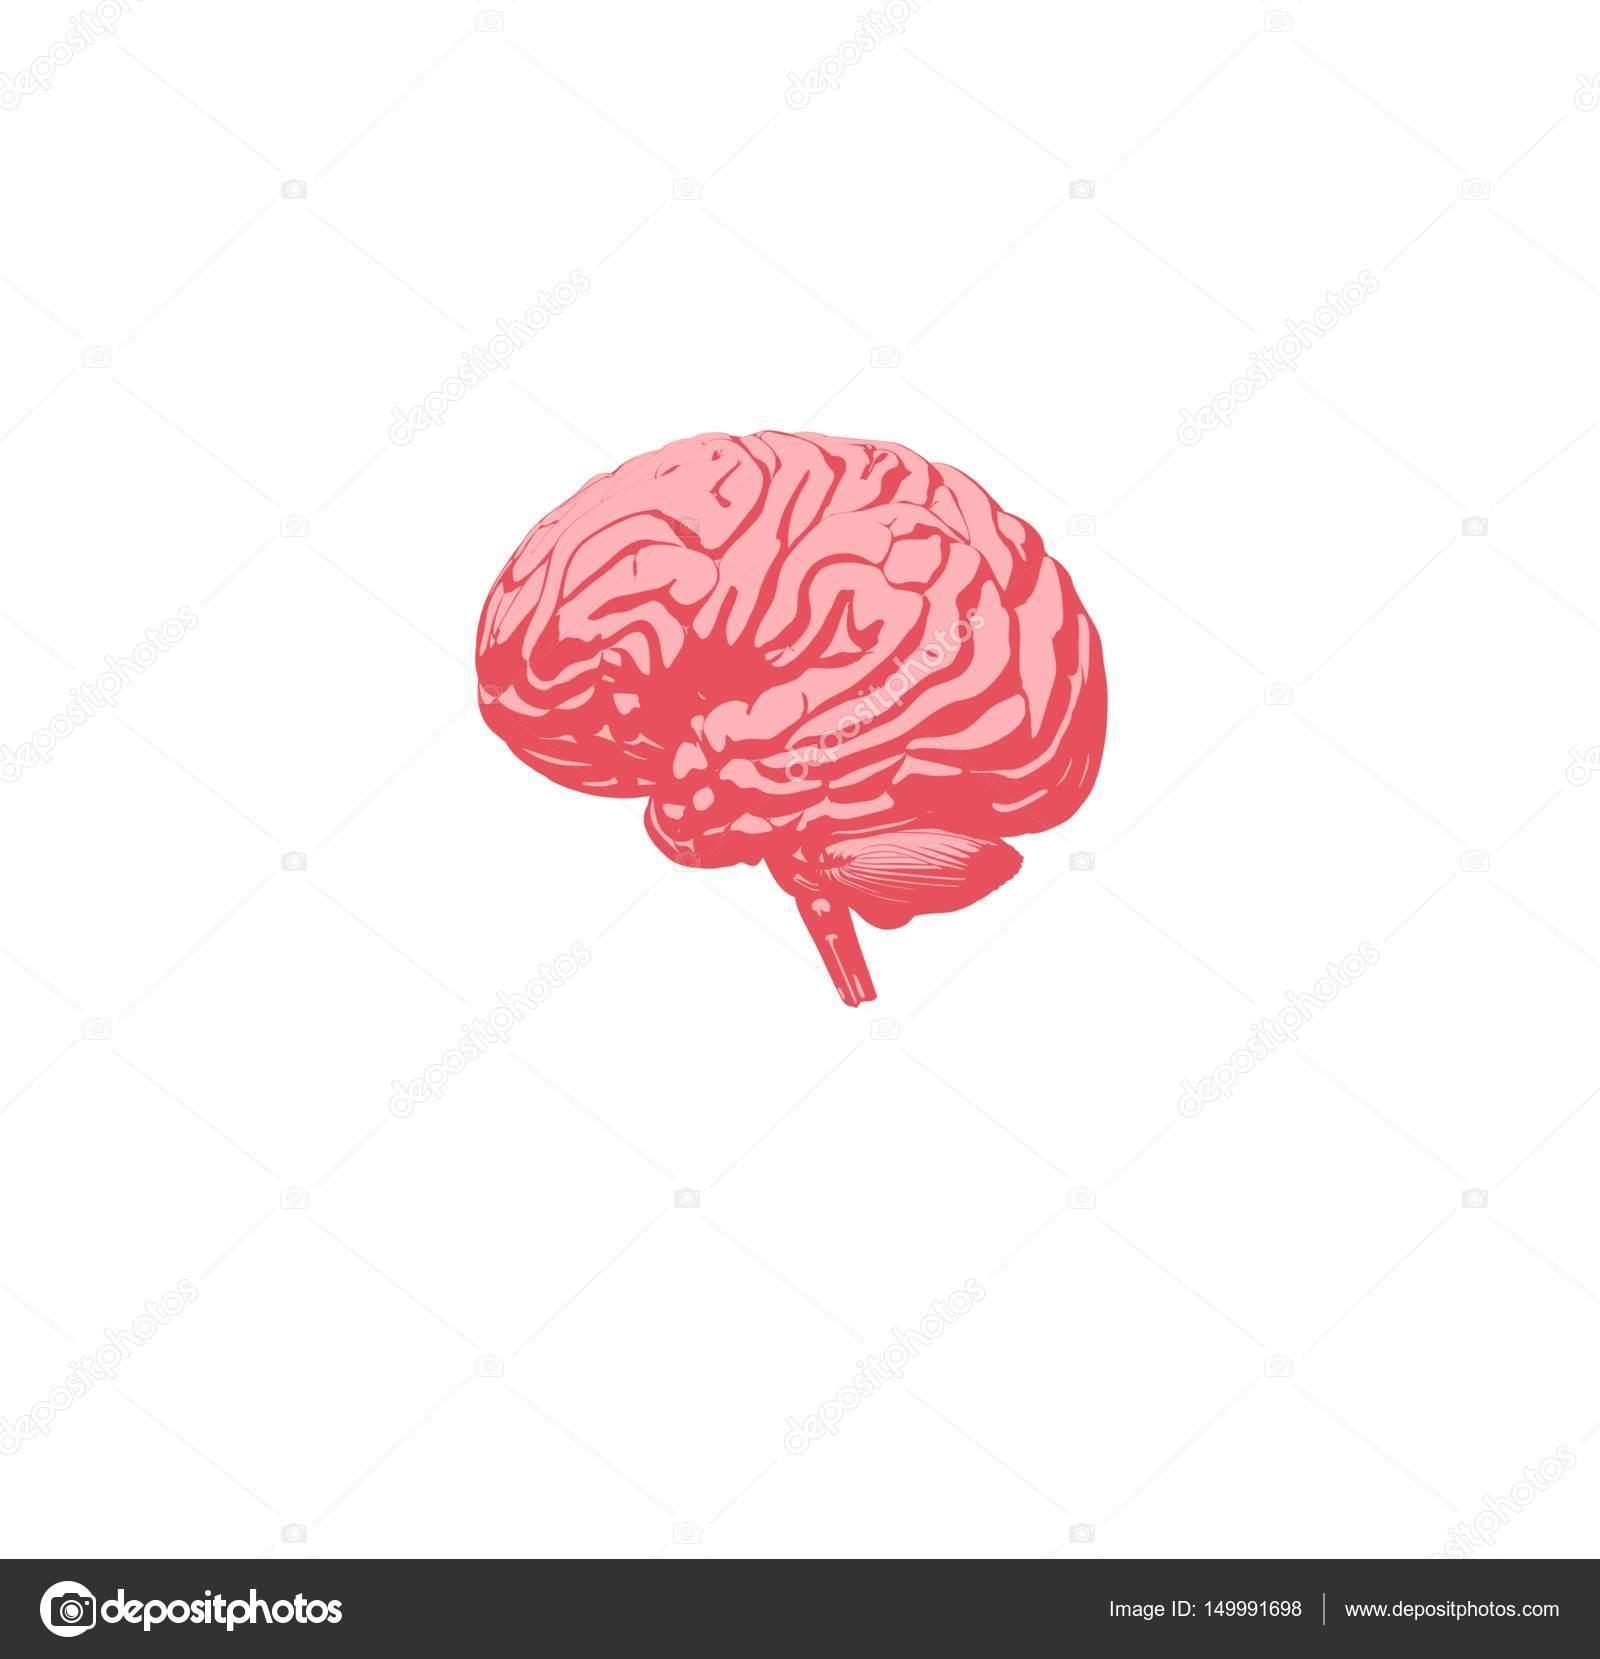 Icono de modelo de cerebro humano Anatomía — Fotos de Stock ...